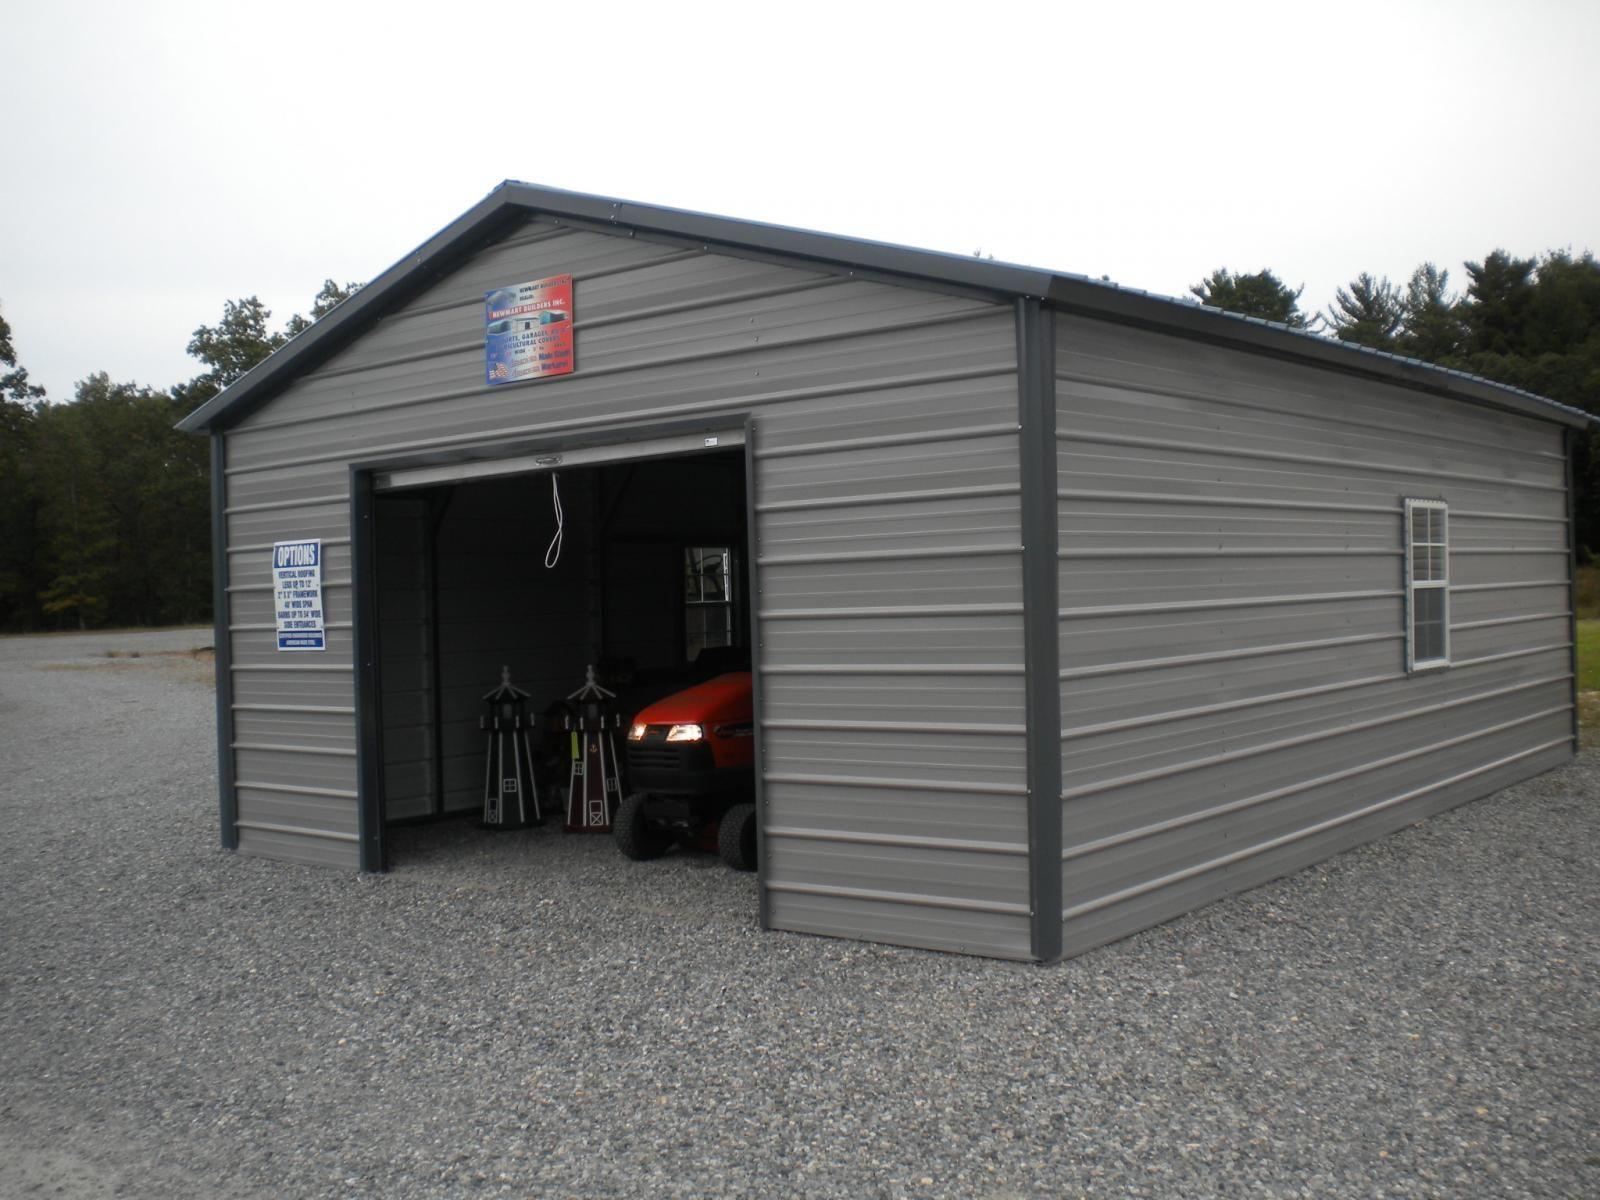 Related image Enclosed carport, Carport garage, Carport